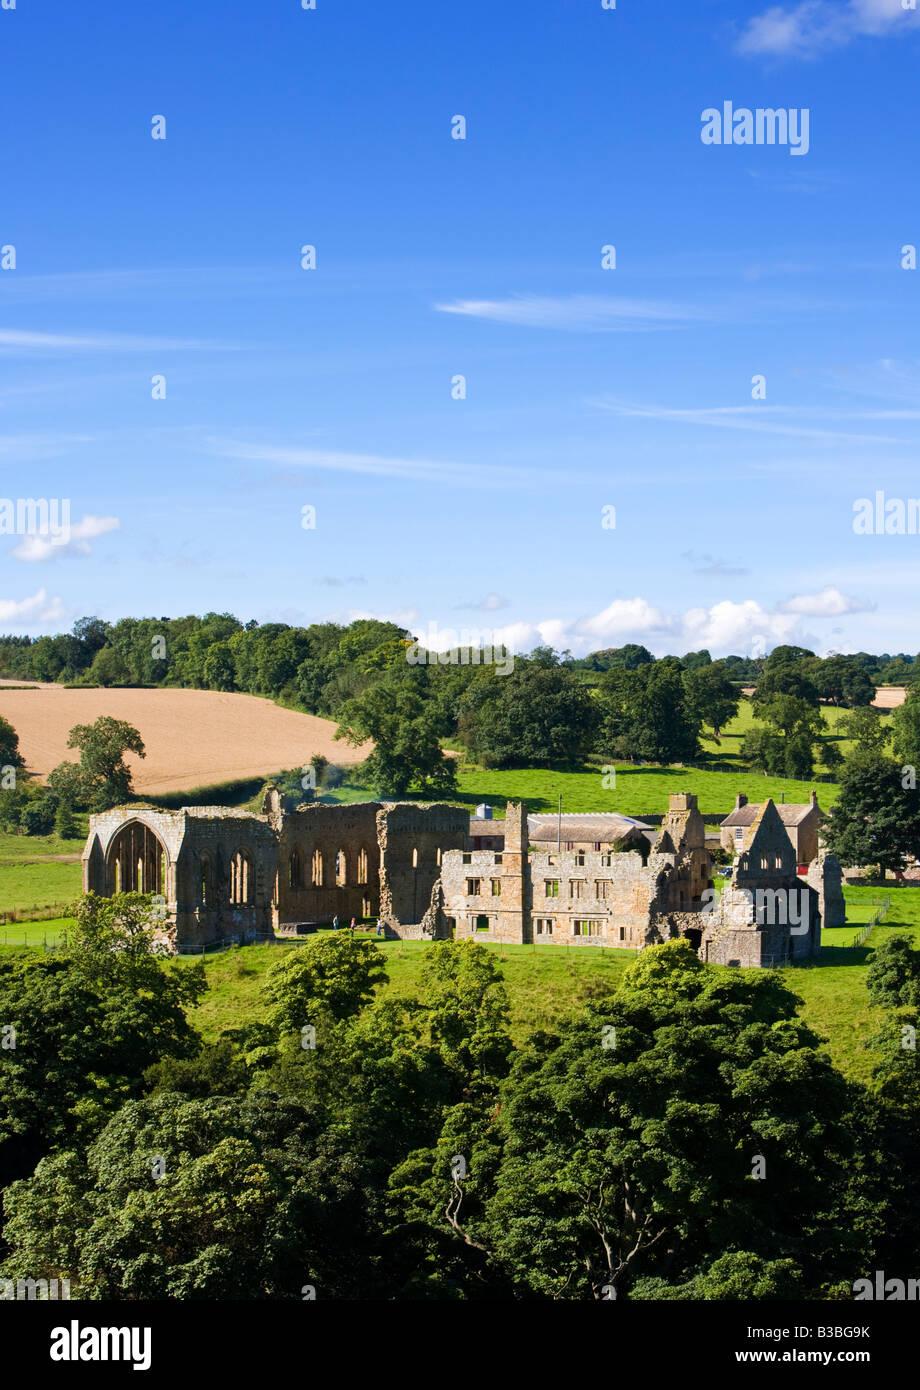 Ruins of Egglestone Abbey, Teesdale, County Durham, England, UK - Stock Image